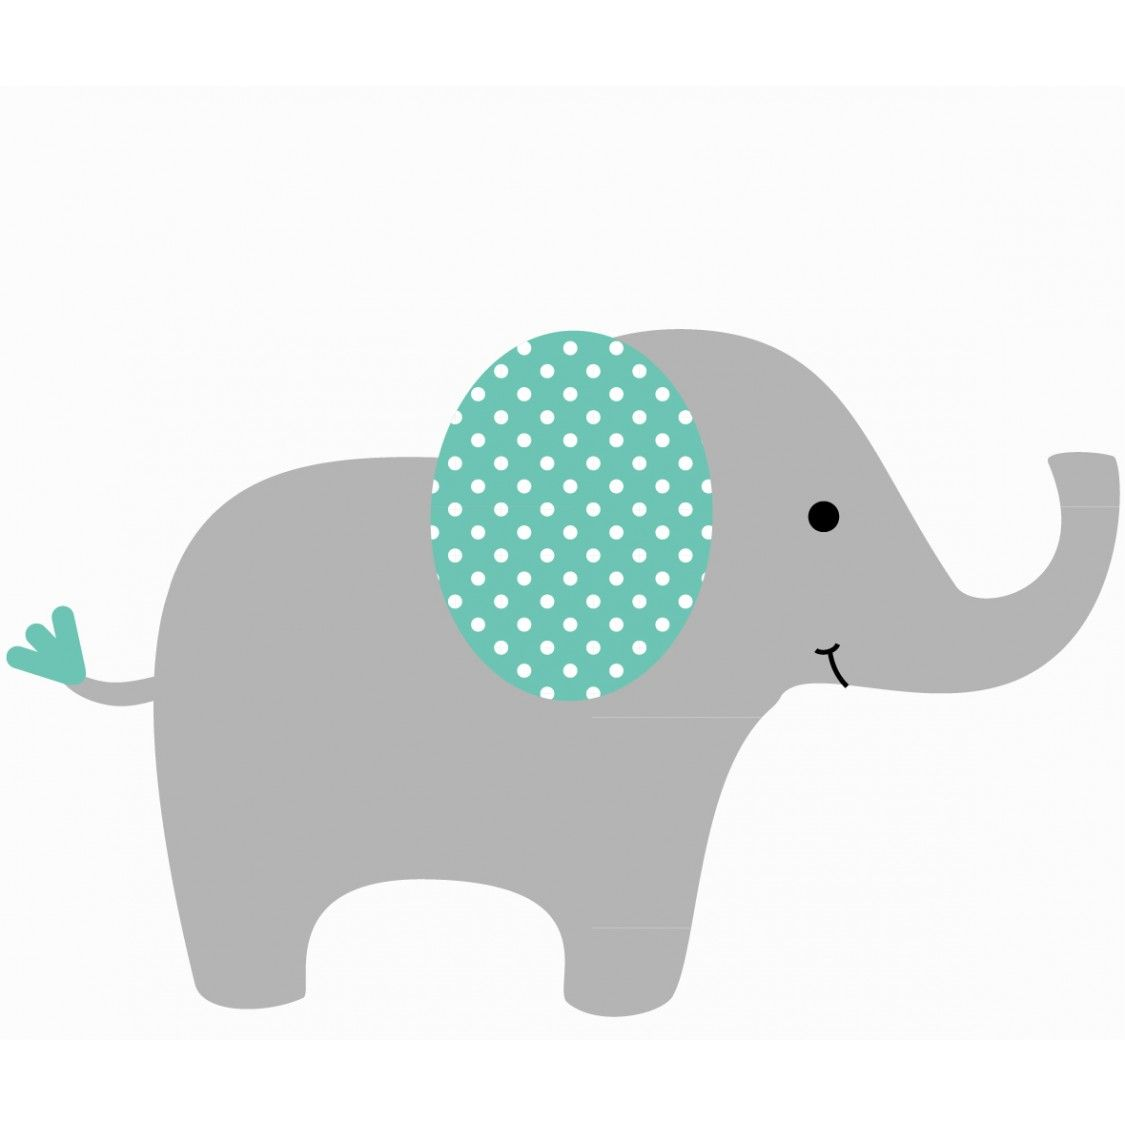 Gray and yellow chevron zig zag unisex baby bedding 9pc girl or boy crib  set. - Gray Baby Elephant PNG